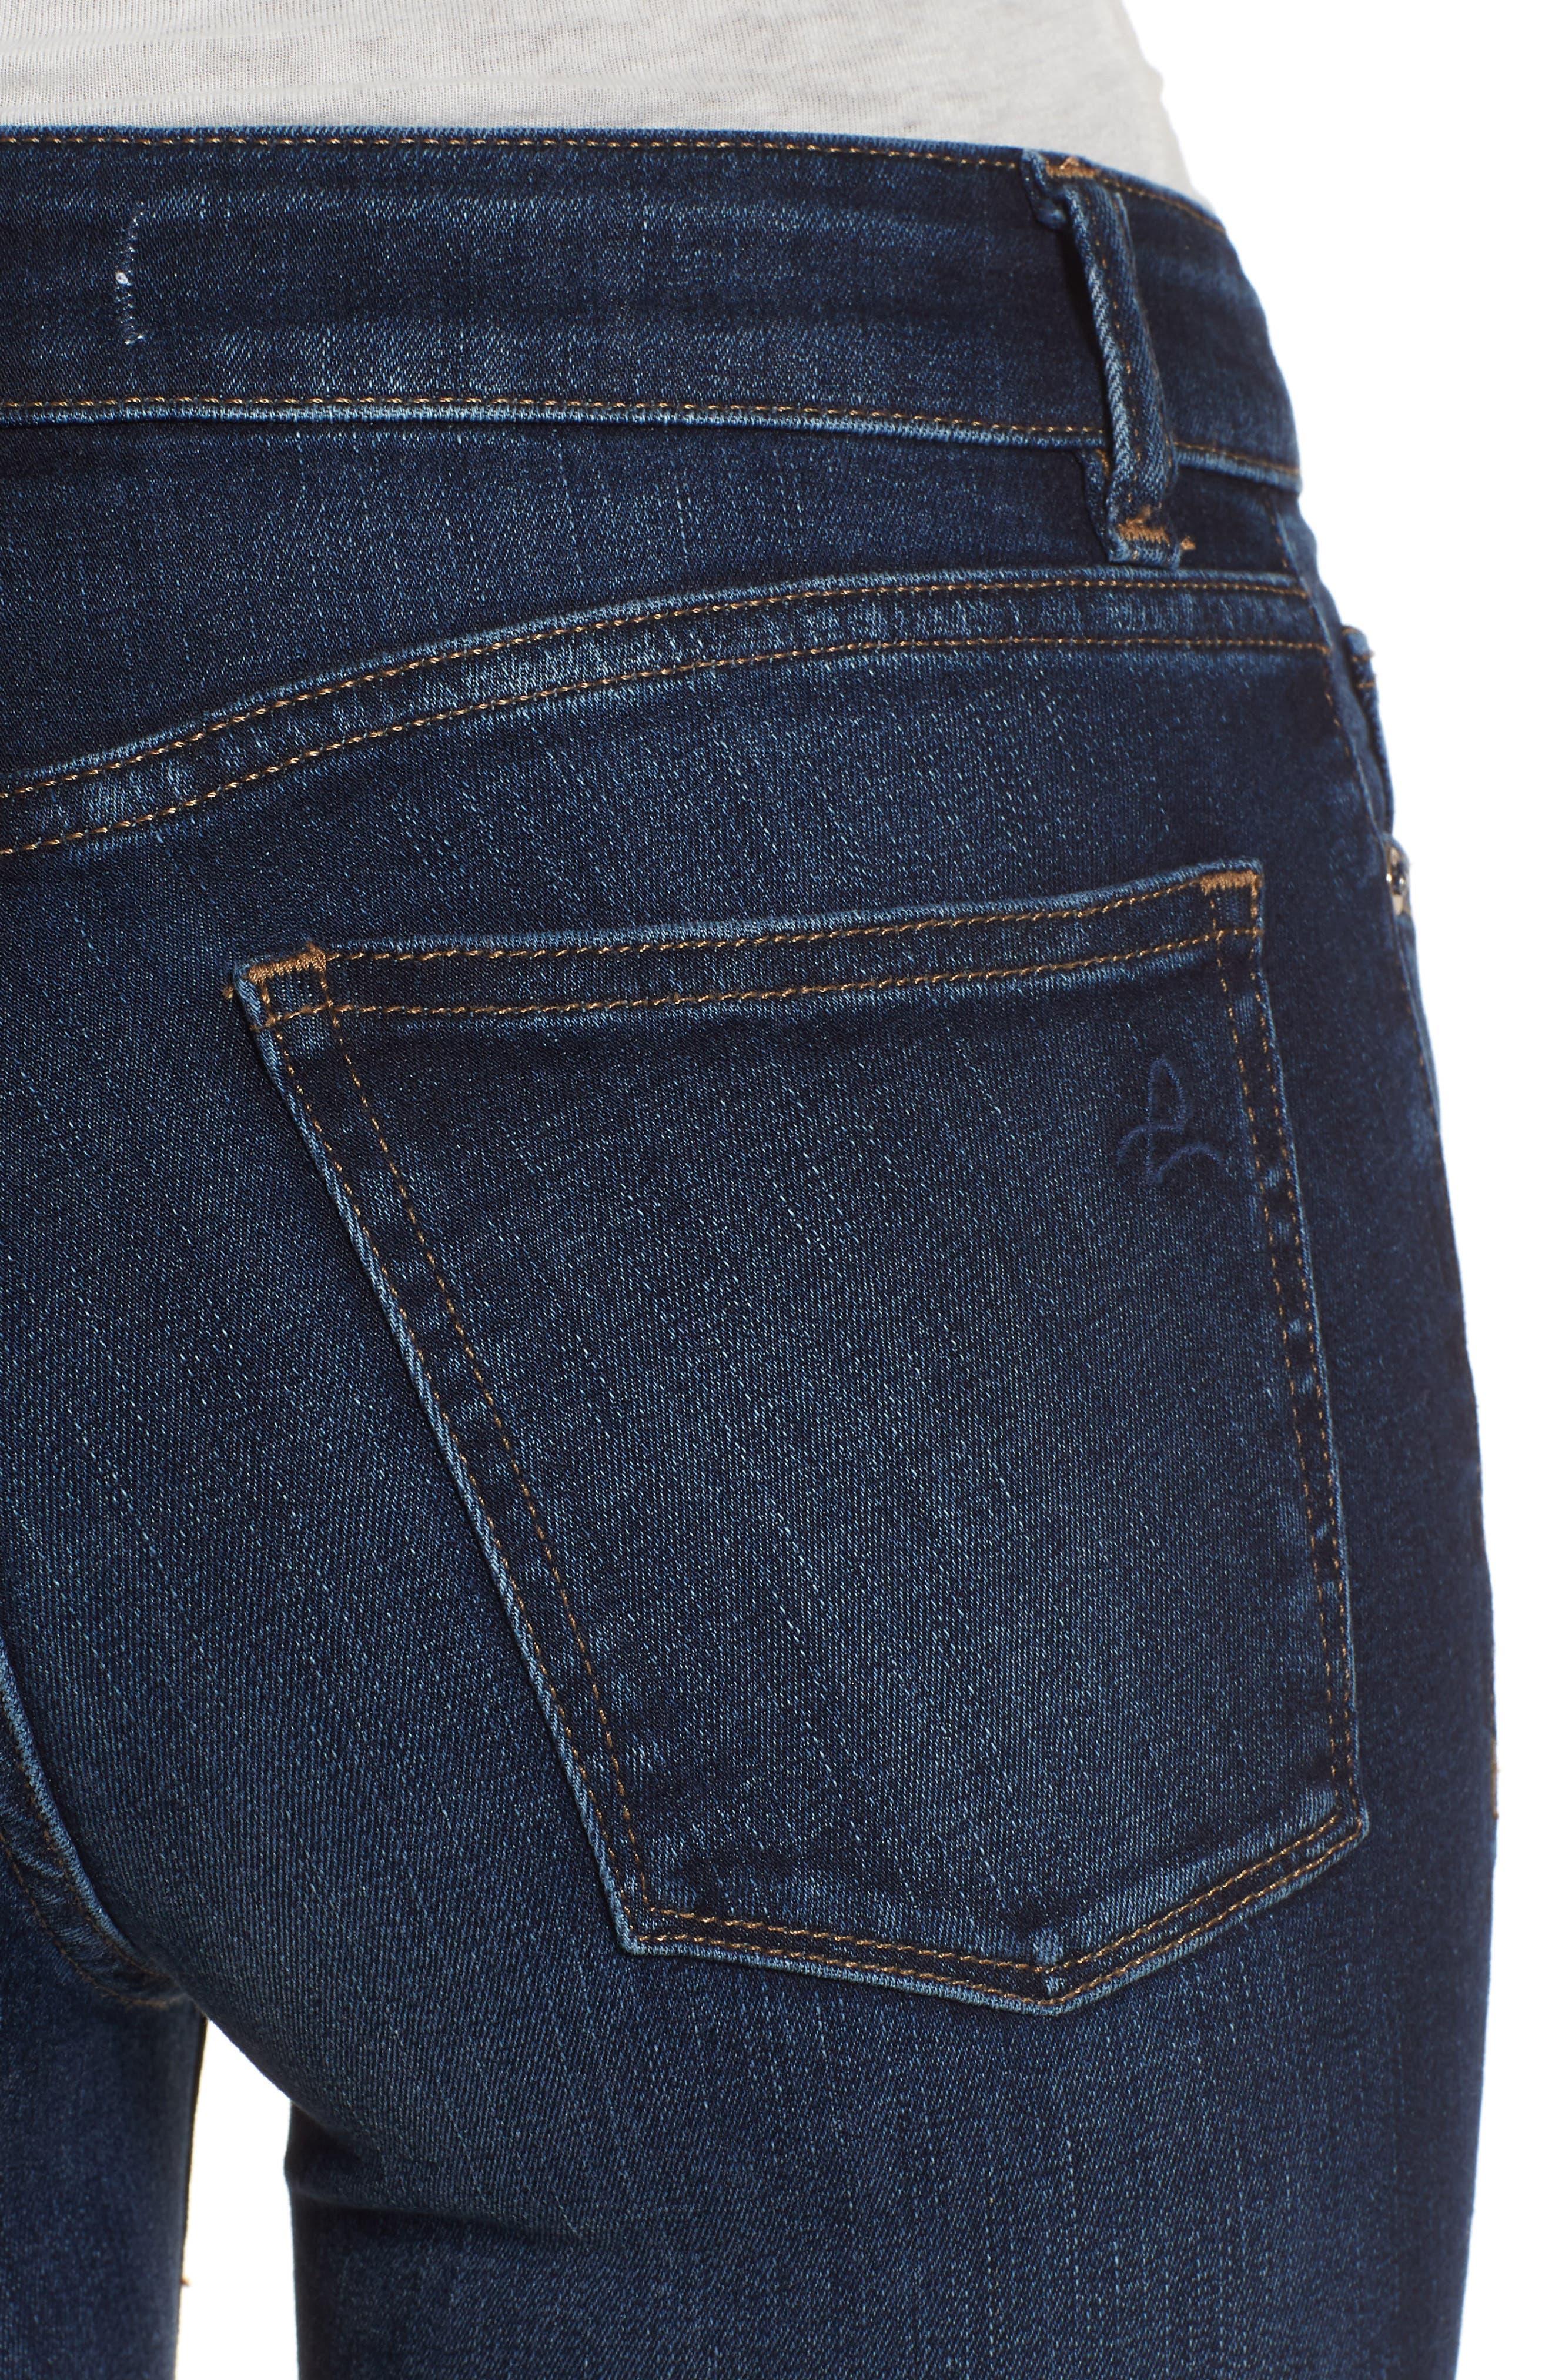 Florence Instasculpt Crop Skinny Jeans,                             Alternate thumbnail 4, color,                             Ralston